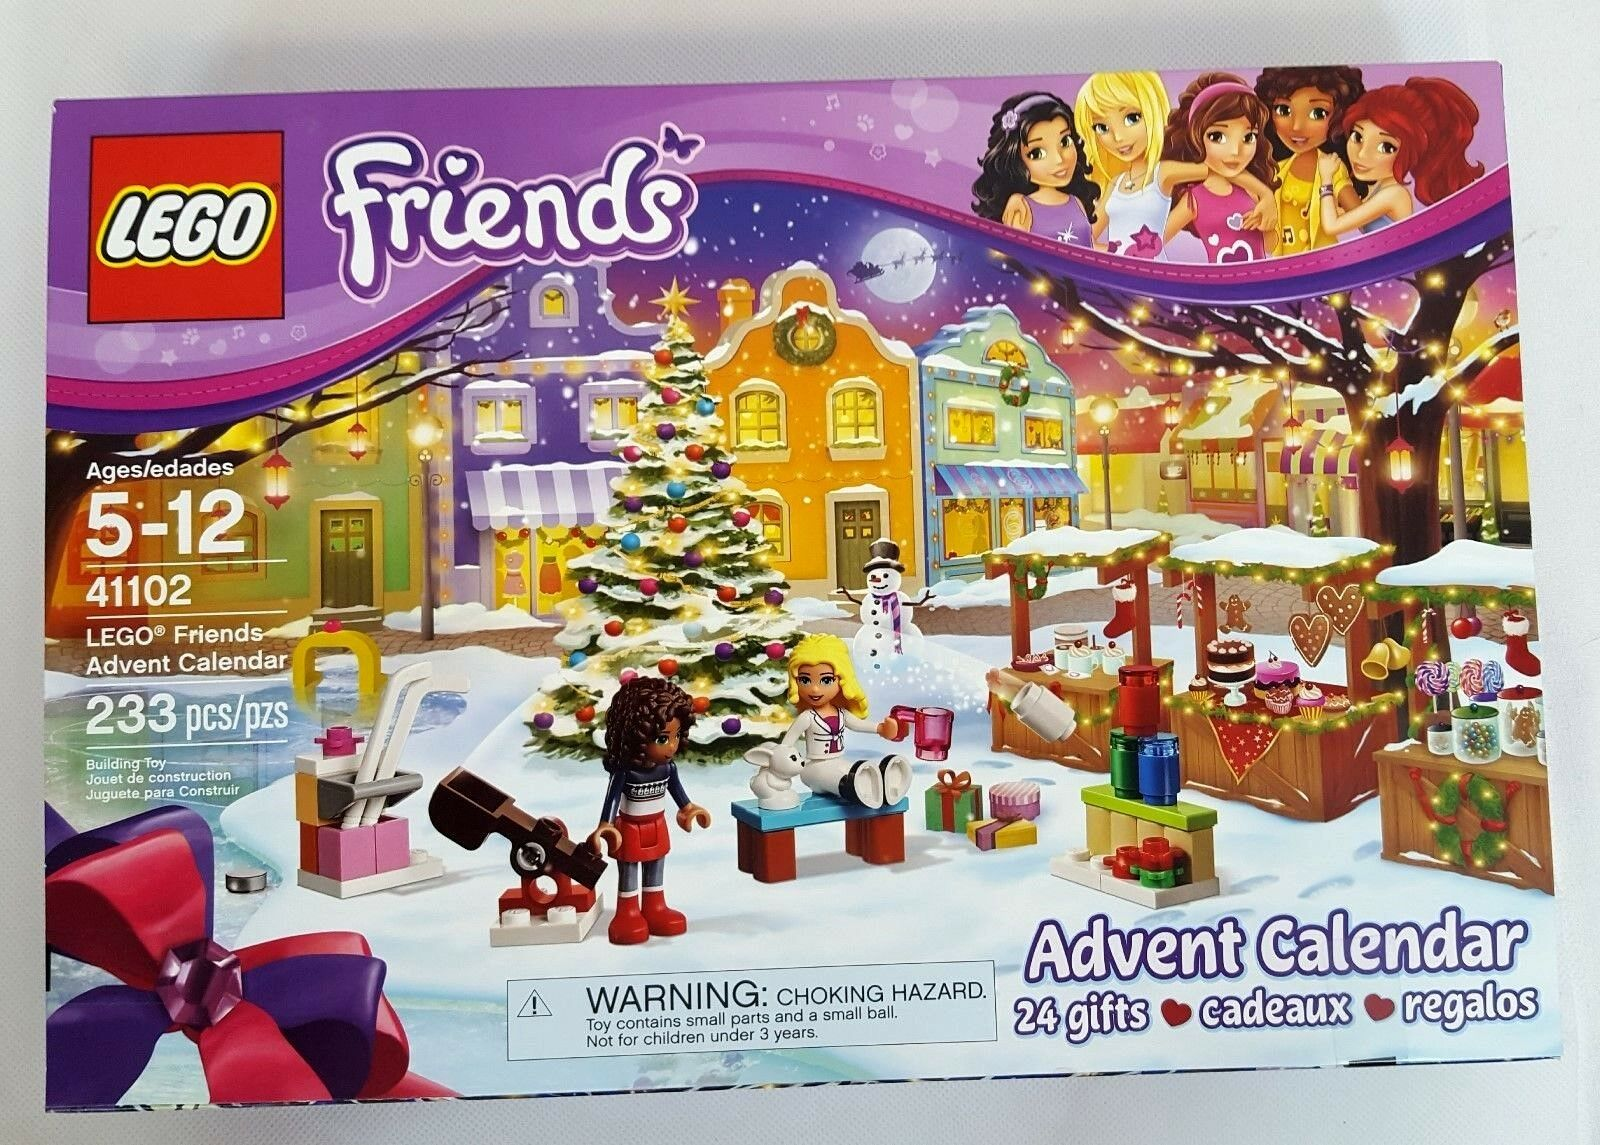 LEGO Girls FRIENDS 2015 Christmas ADVENT CALENDAR Building Kit NEW in BOX